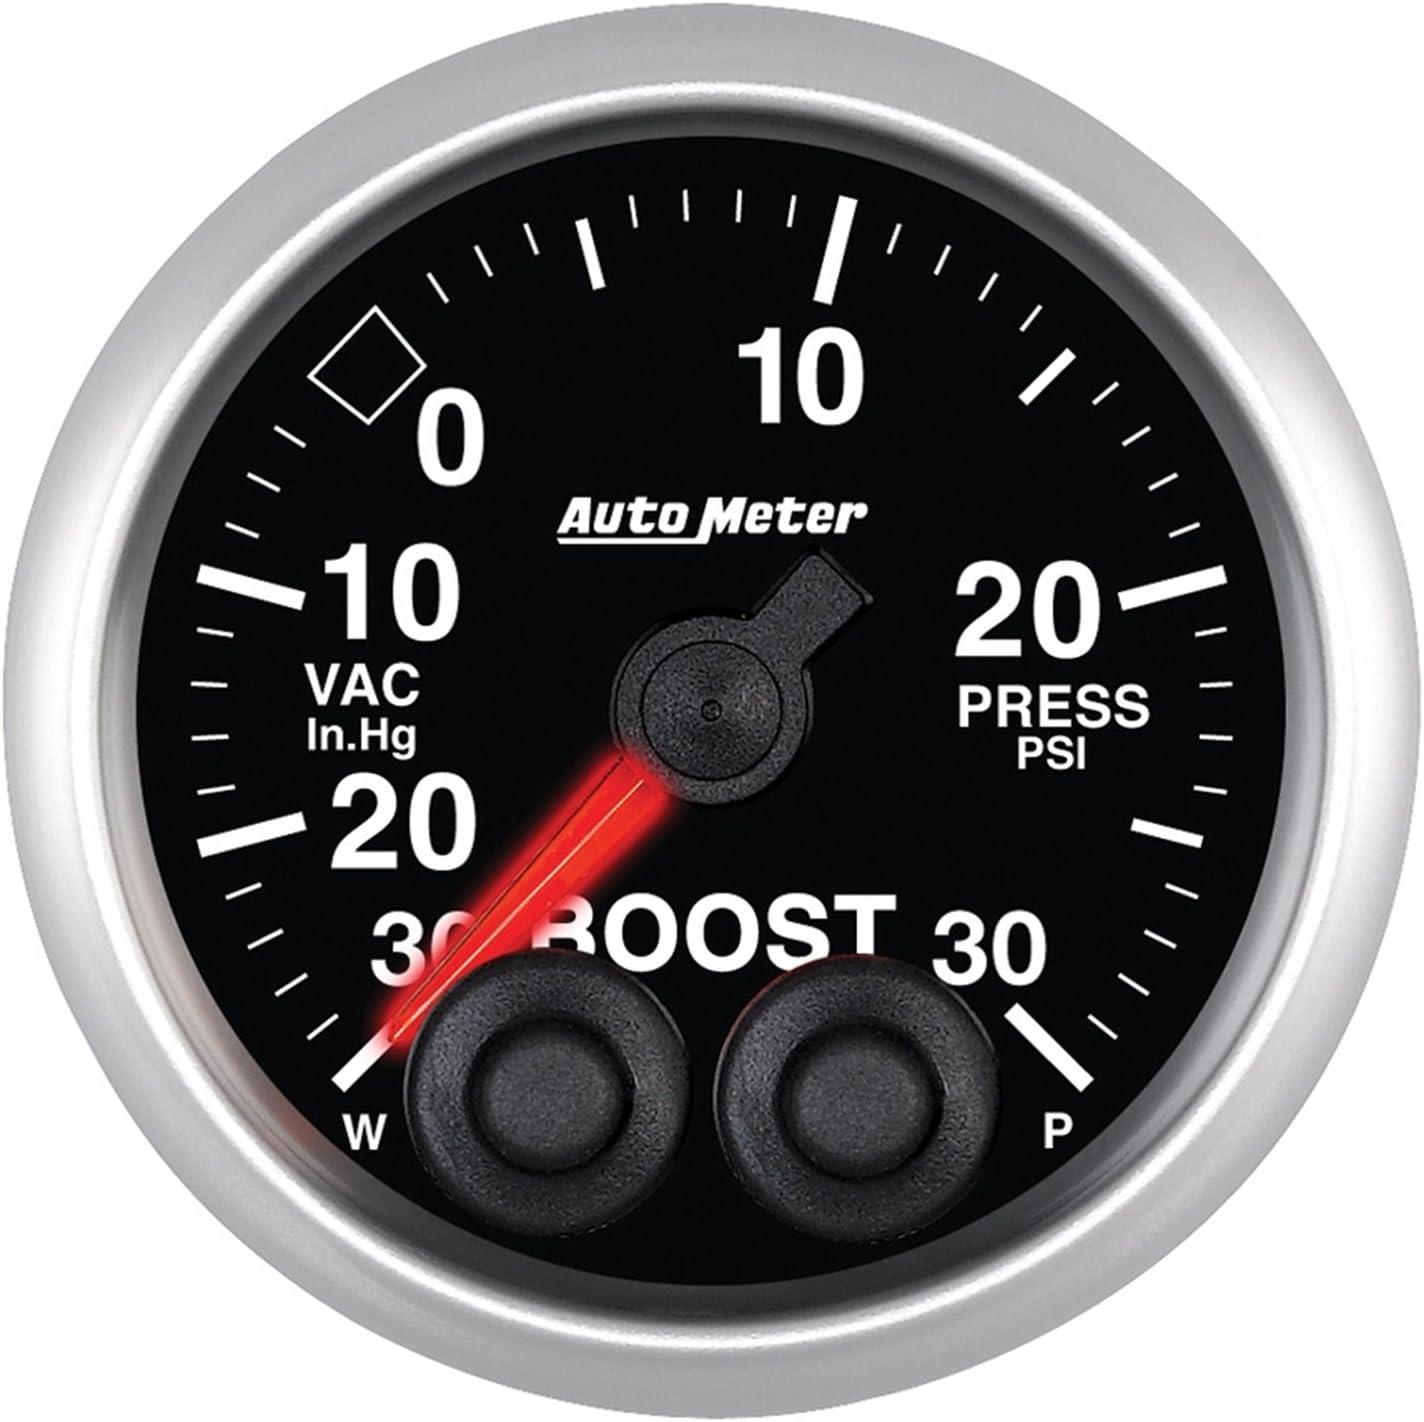 "Auto Meter 5677 Elite 2-1/16"" 30 in Hg-30 PSI Boost-Vacuum Gauge"